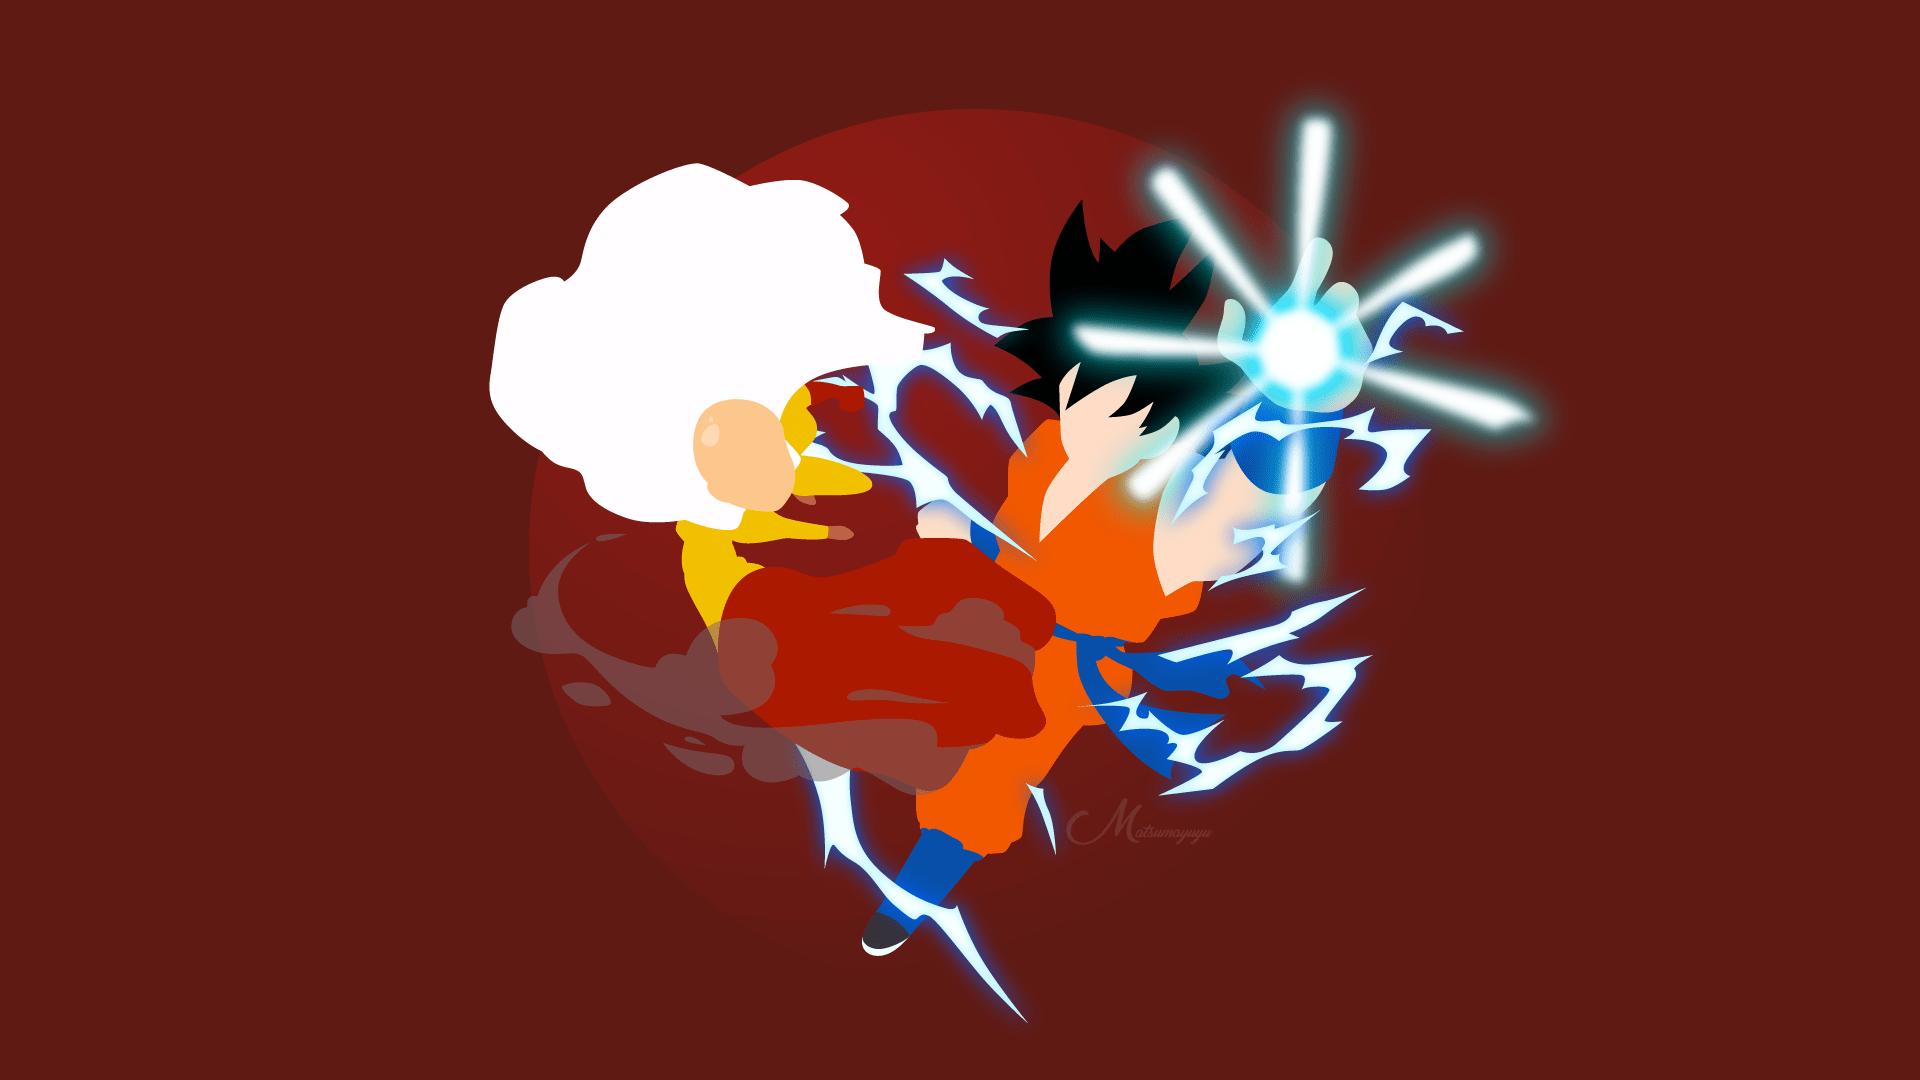 Goku Minimalist Wallpapers Top Free Goku Minimalist Backgrounds Wallpaperaccess